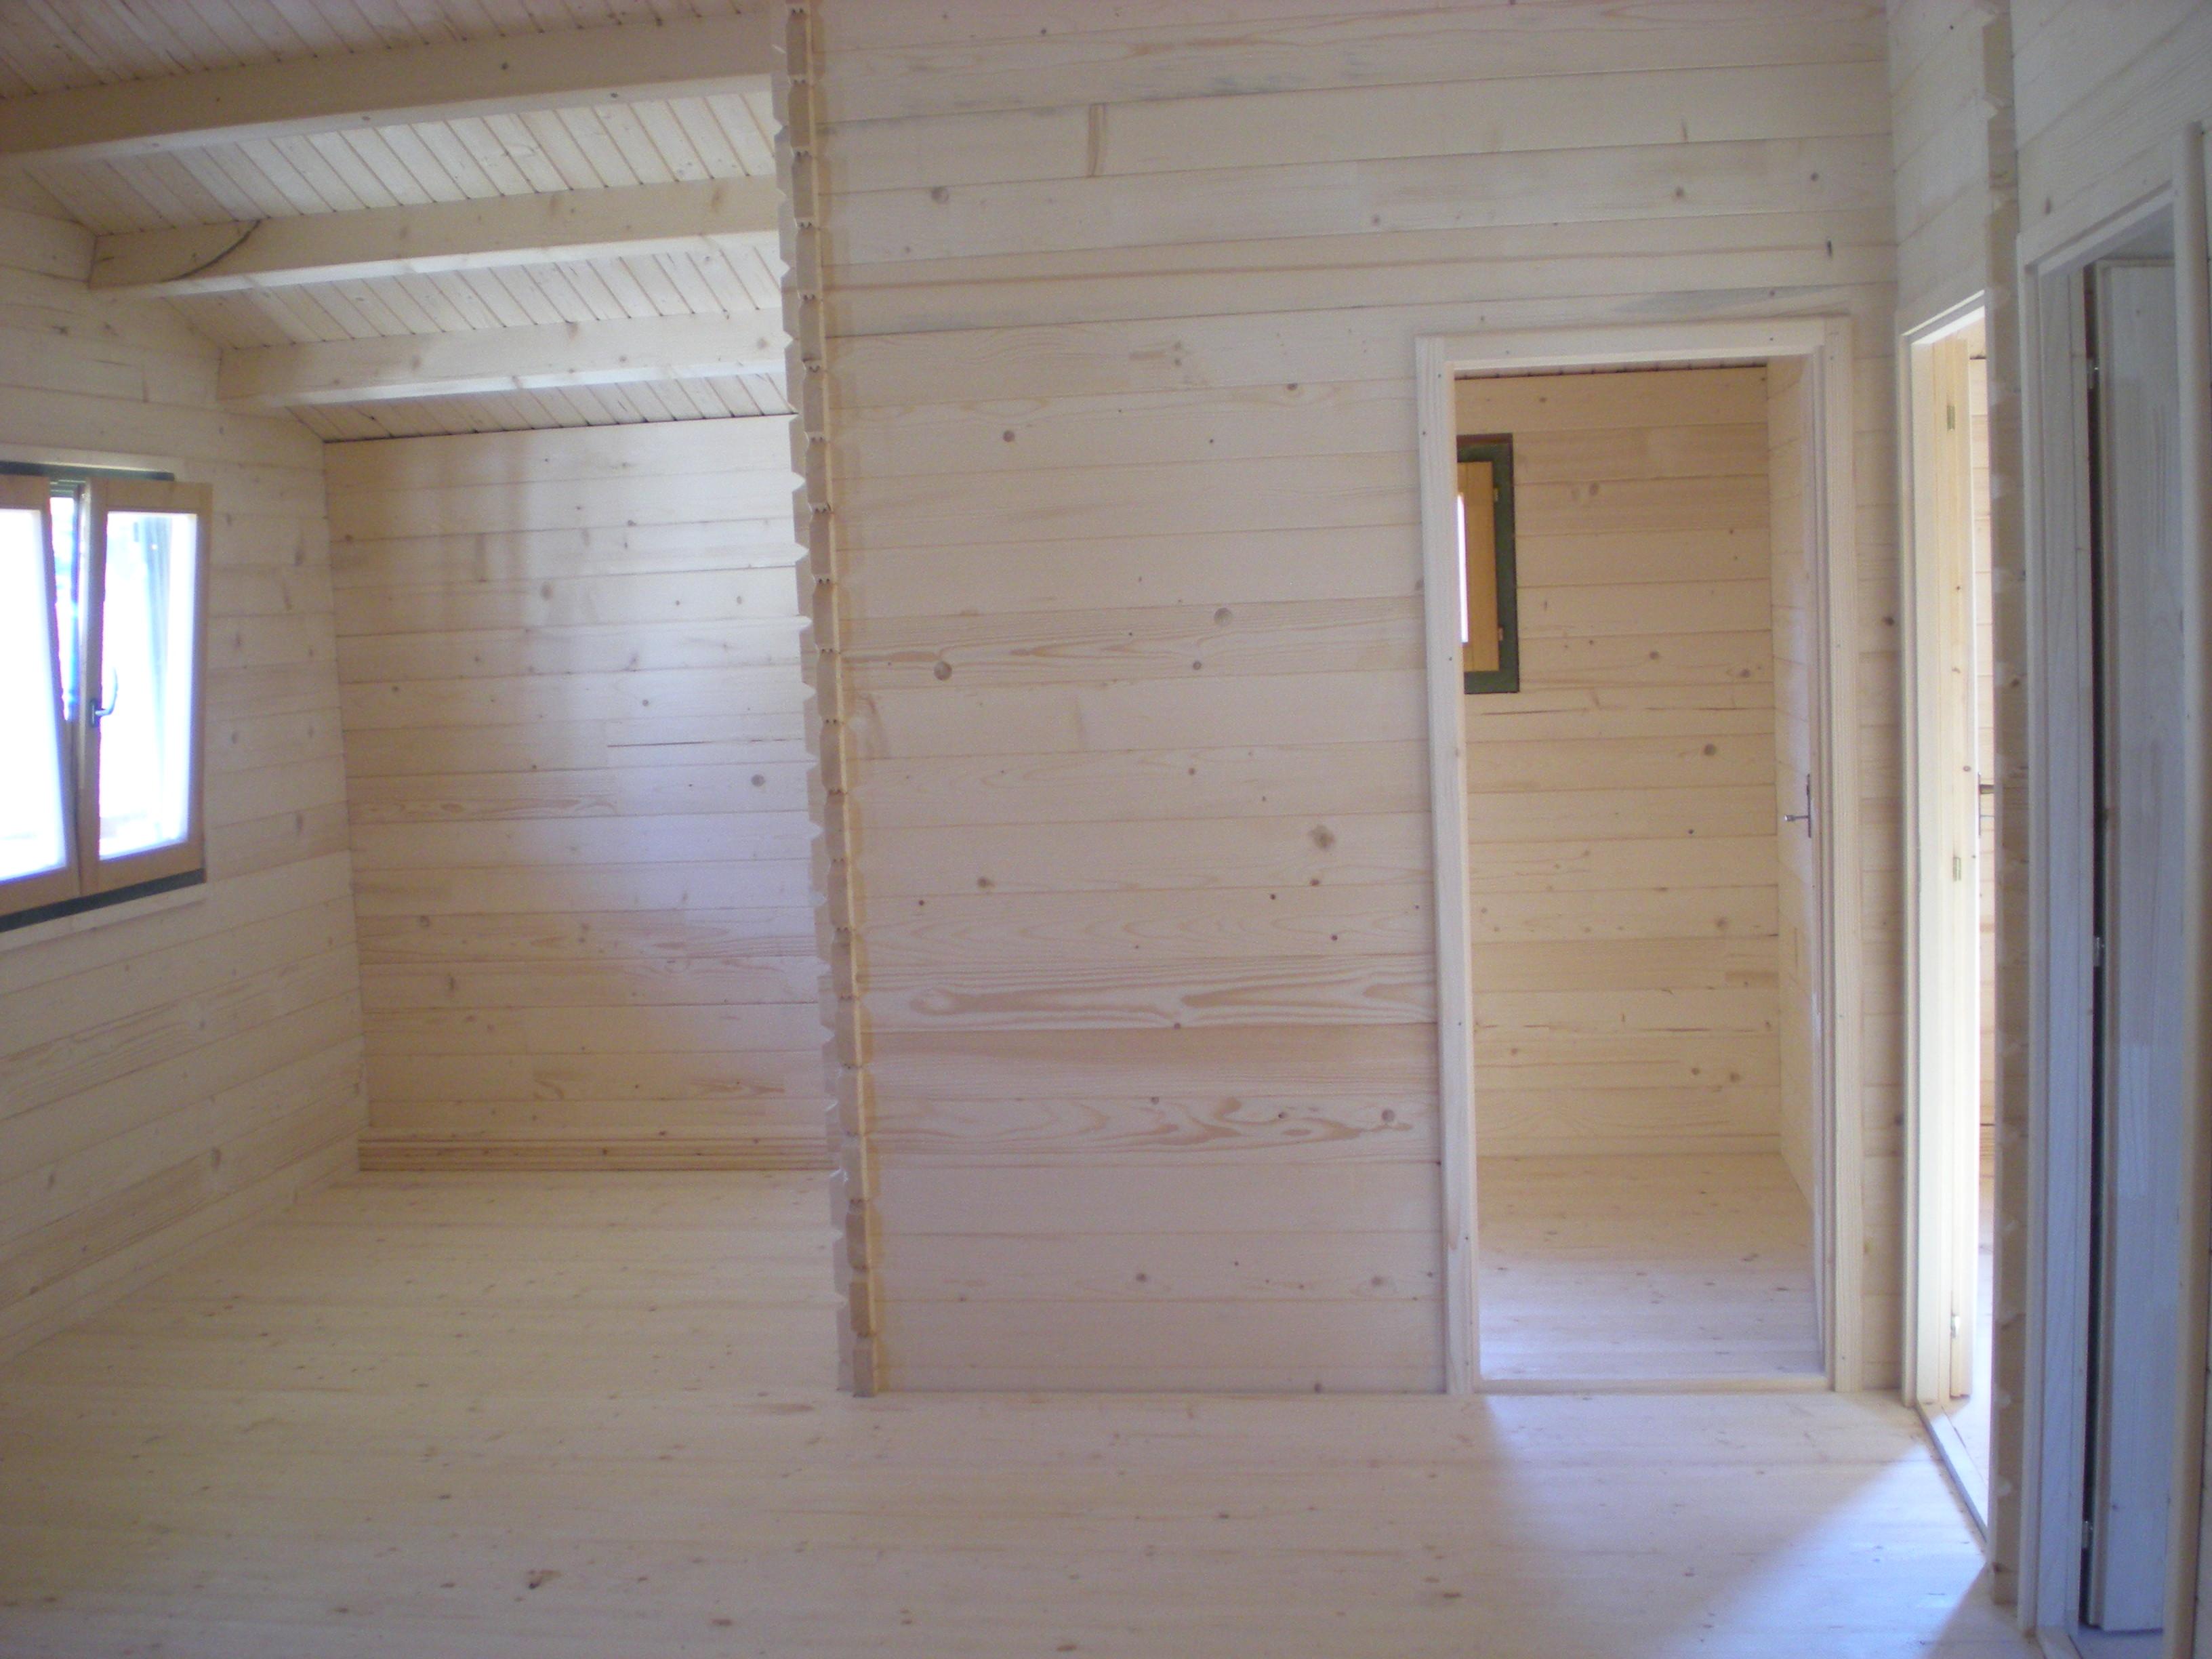 Pareti Di Legno Prezzi : Bungalow invernali mm case in legno u casette in legno per